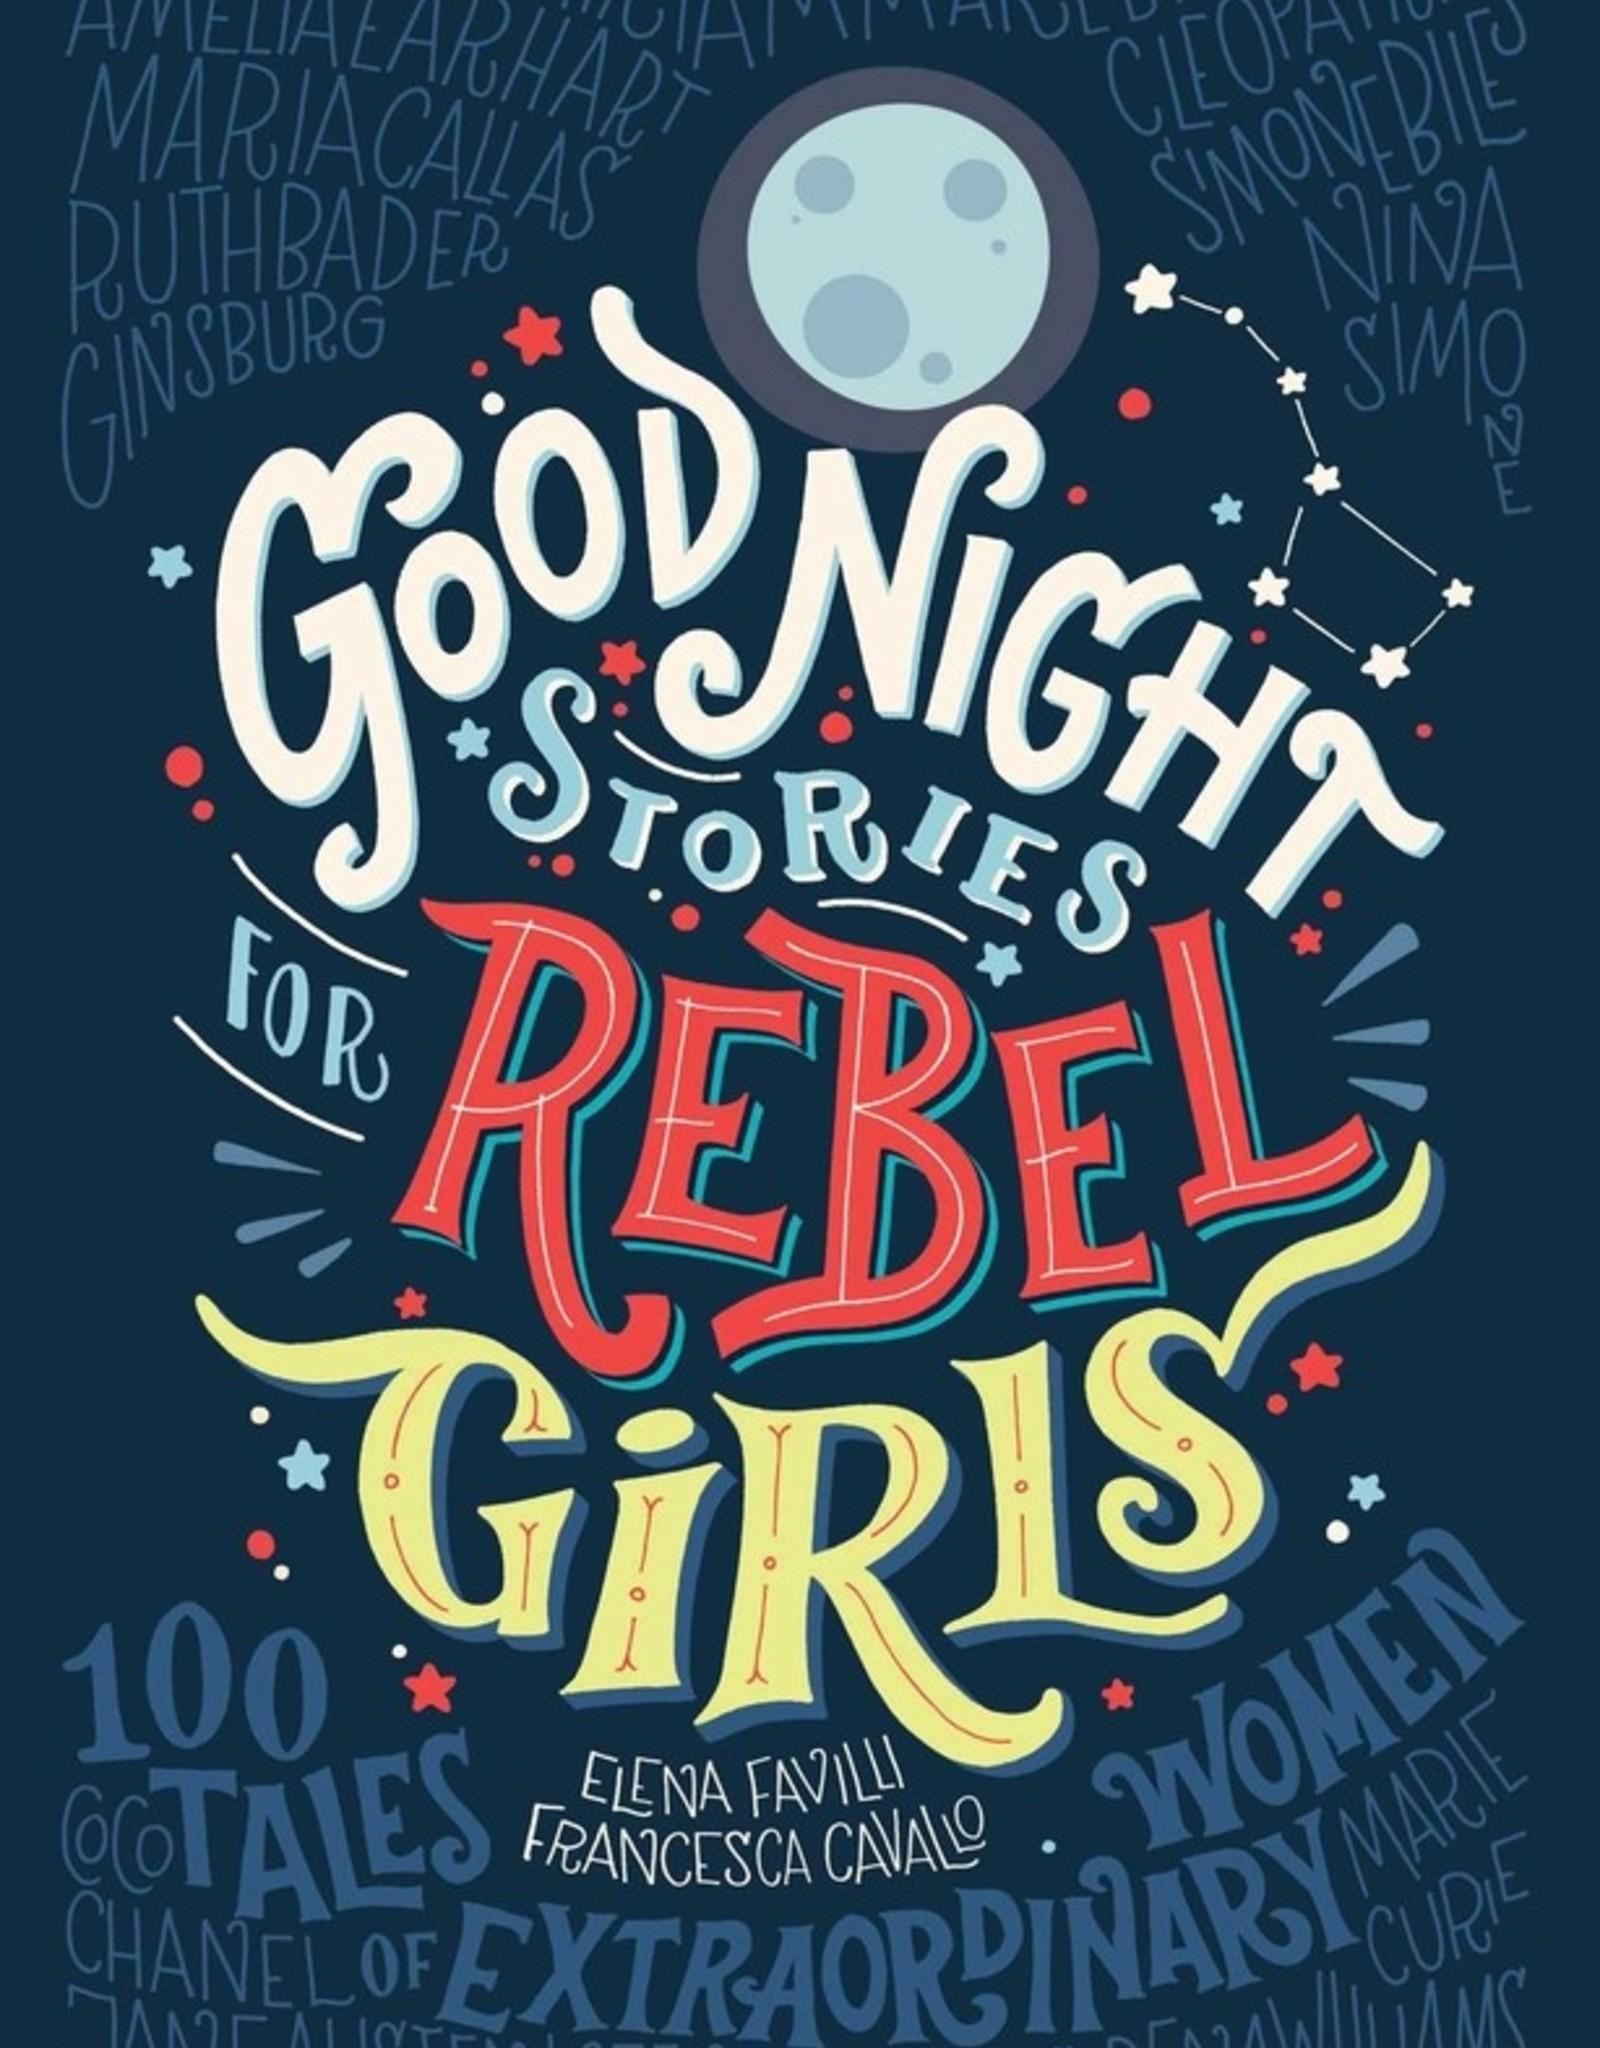 Good Night Stories for Rebel Girls, Volume 1 - Hardcover